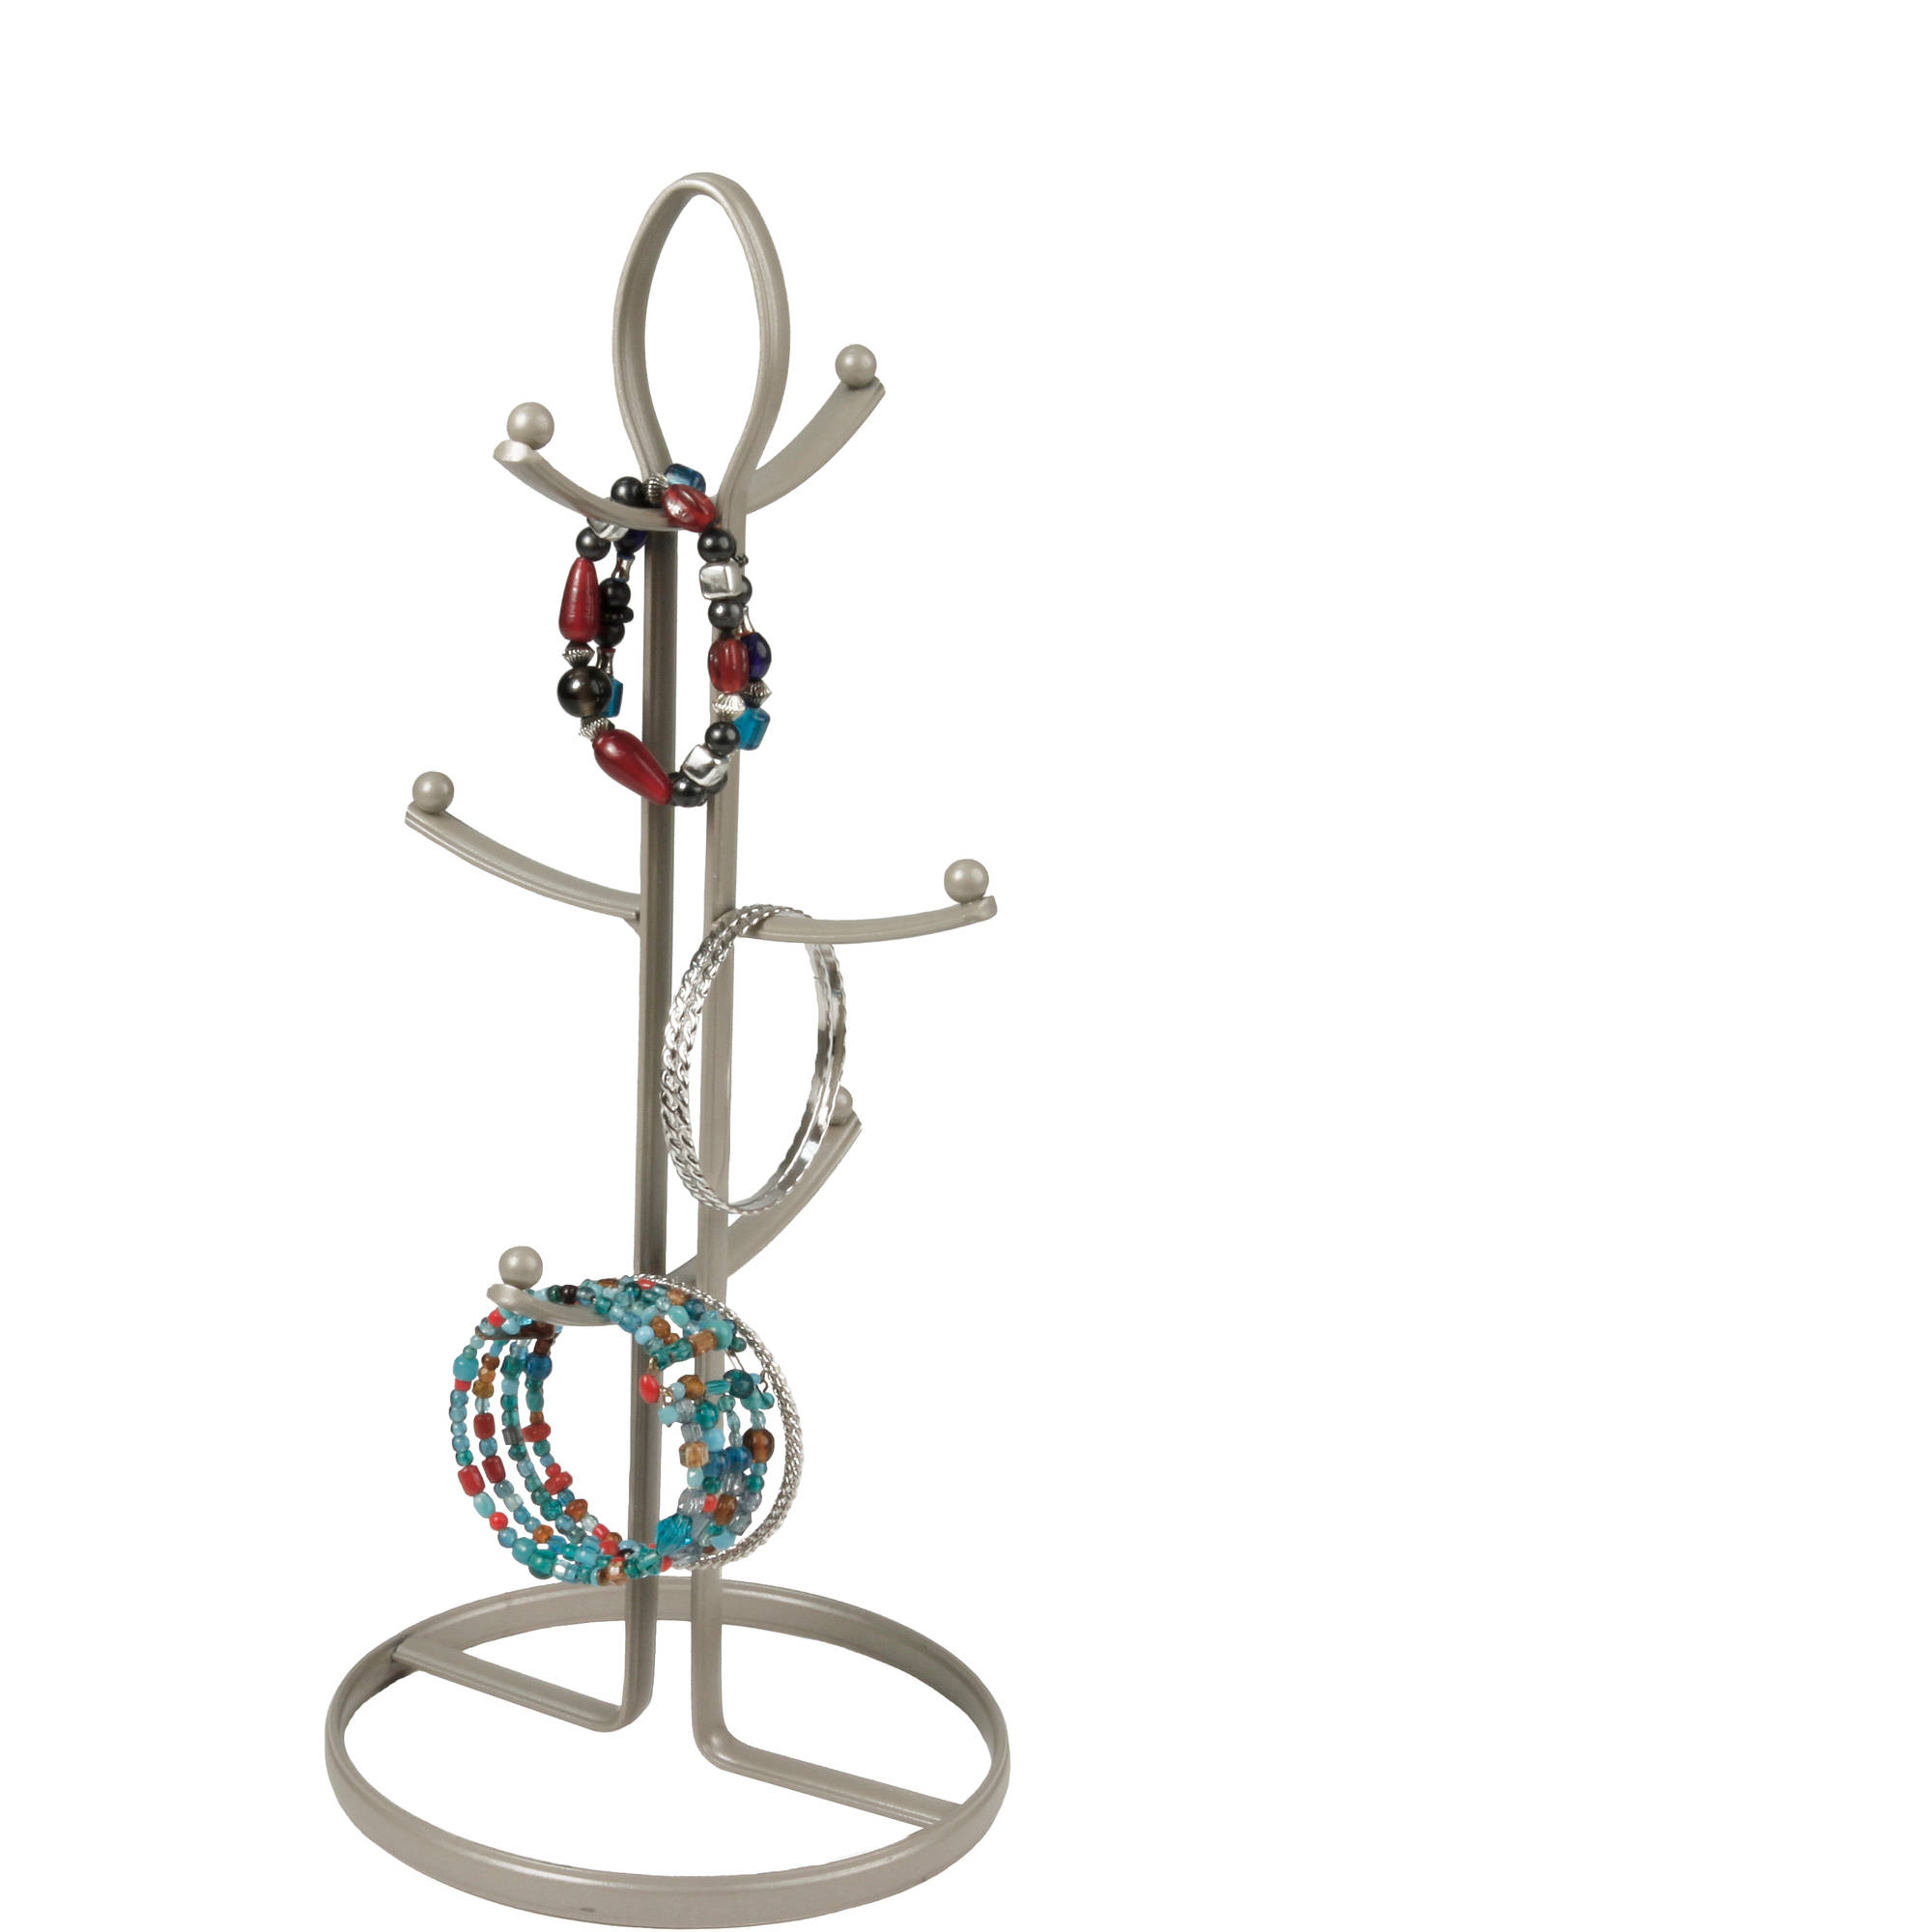 Spectrum Ashley 6-Tier Jewelry Holder, Satin Nickel PC